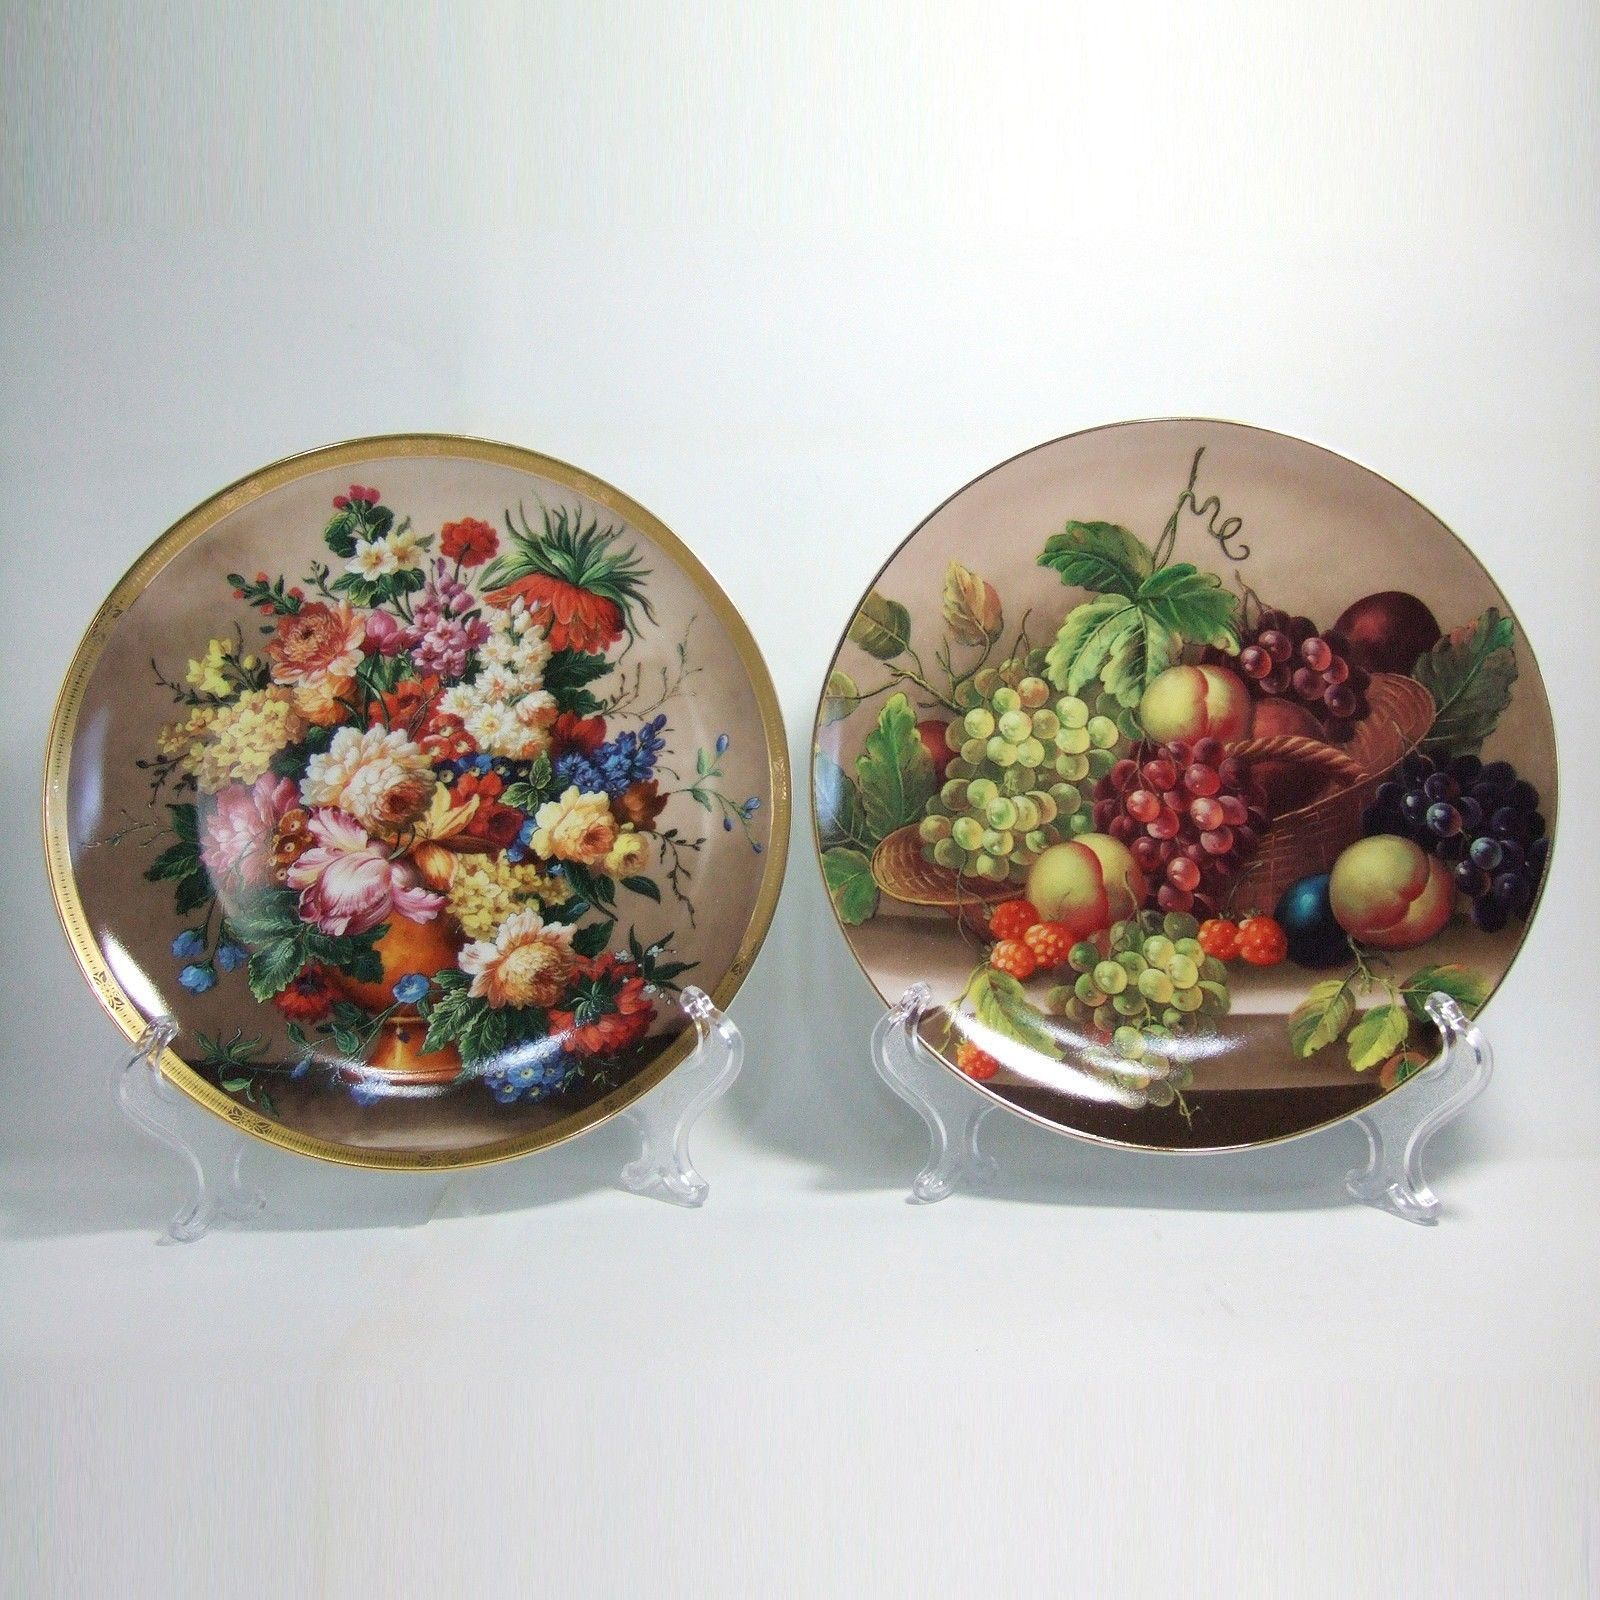 Wall Hangings Decorative Plates Home Decor Ceramic Porcelain Art ...